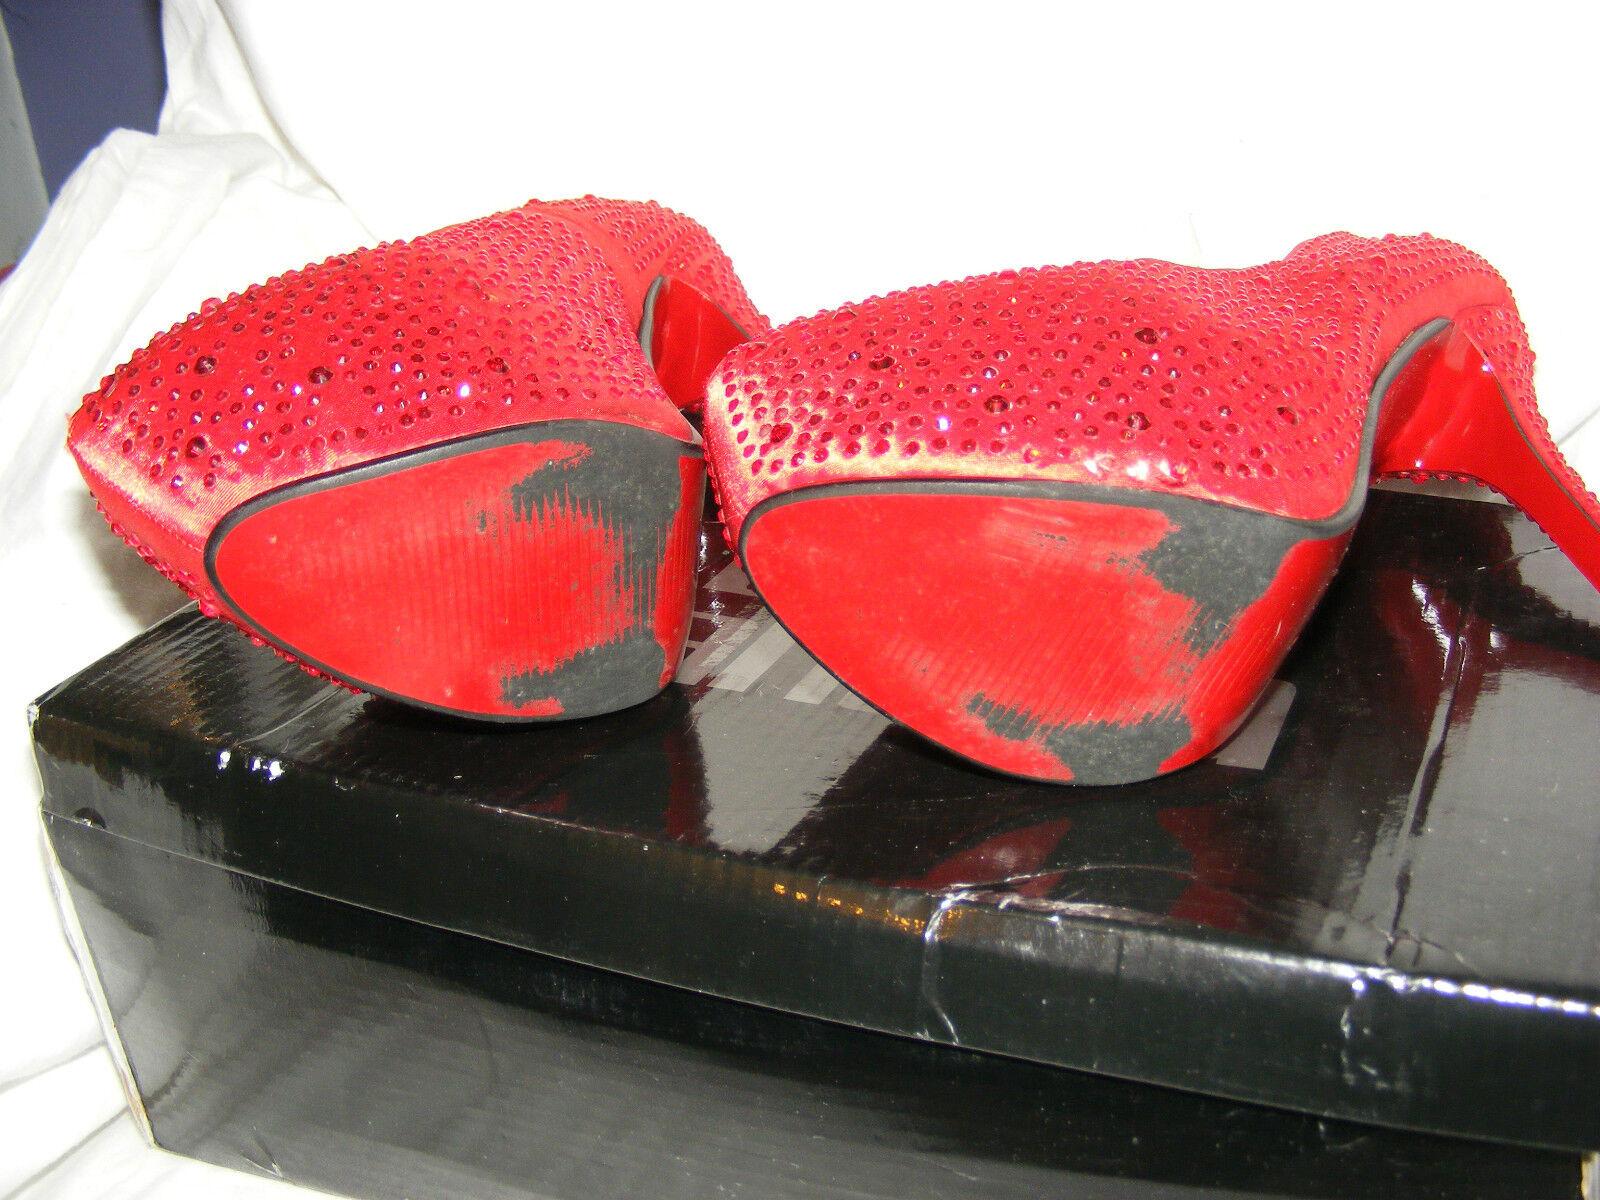 Blau BANANA PLATFORM ROT DIAMANTE CRYSTAL WOMEN'S PLATFORM BANANA STILETTO  Schuhe 41 UK 8 XMAS 765de3